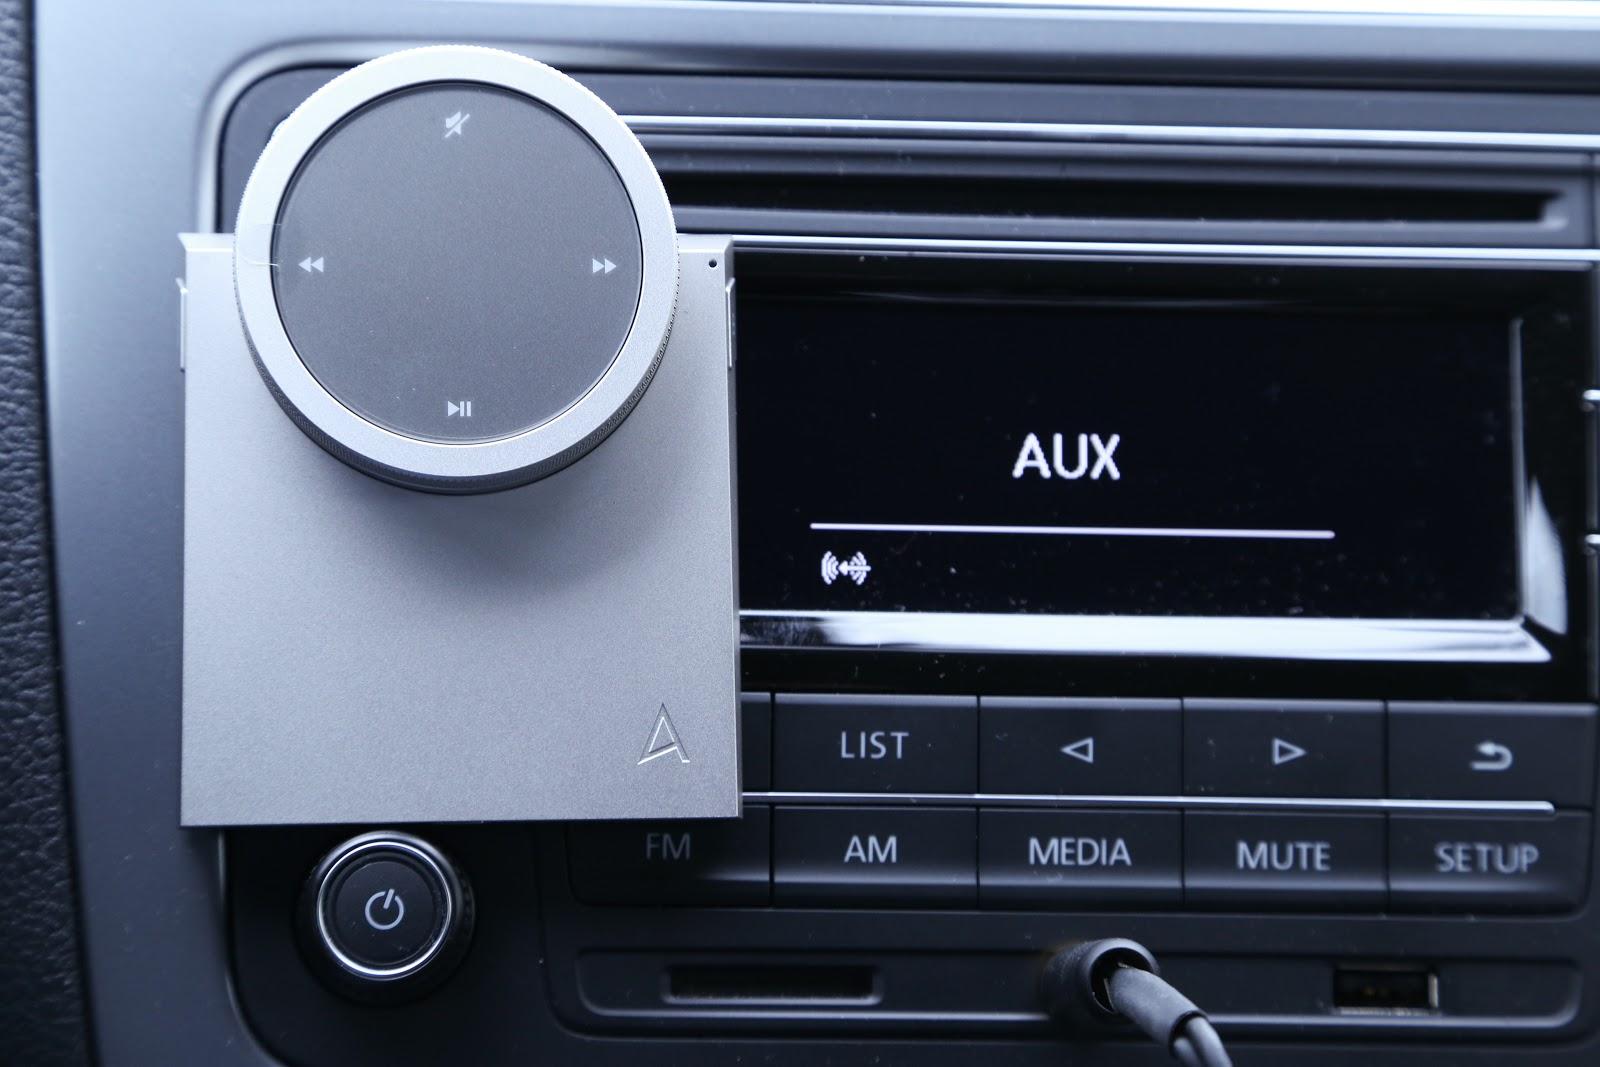 На четырех колесах: аудиоплеер Astell&Kern AK100 II и пульт AK RM01 - 27